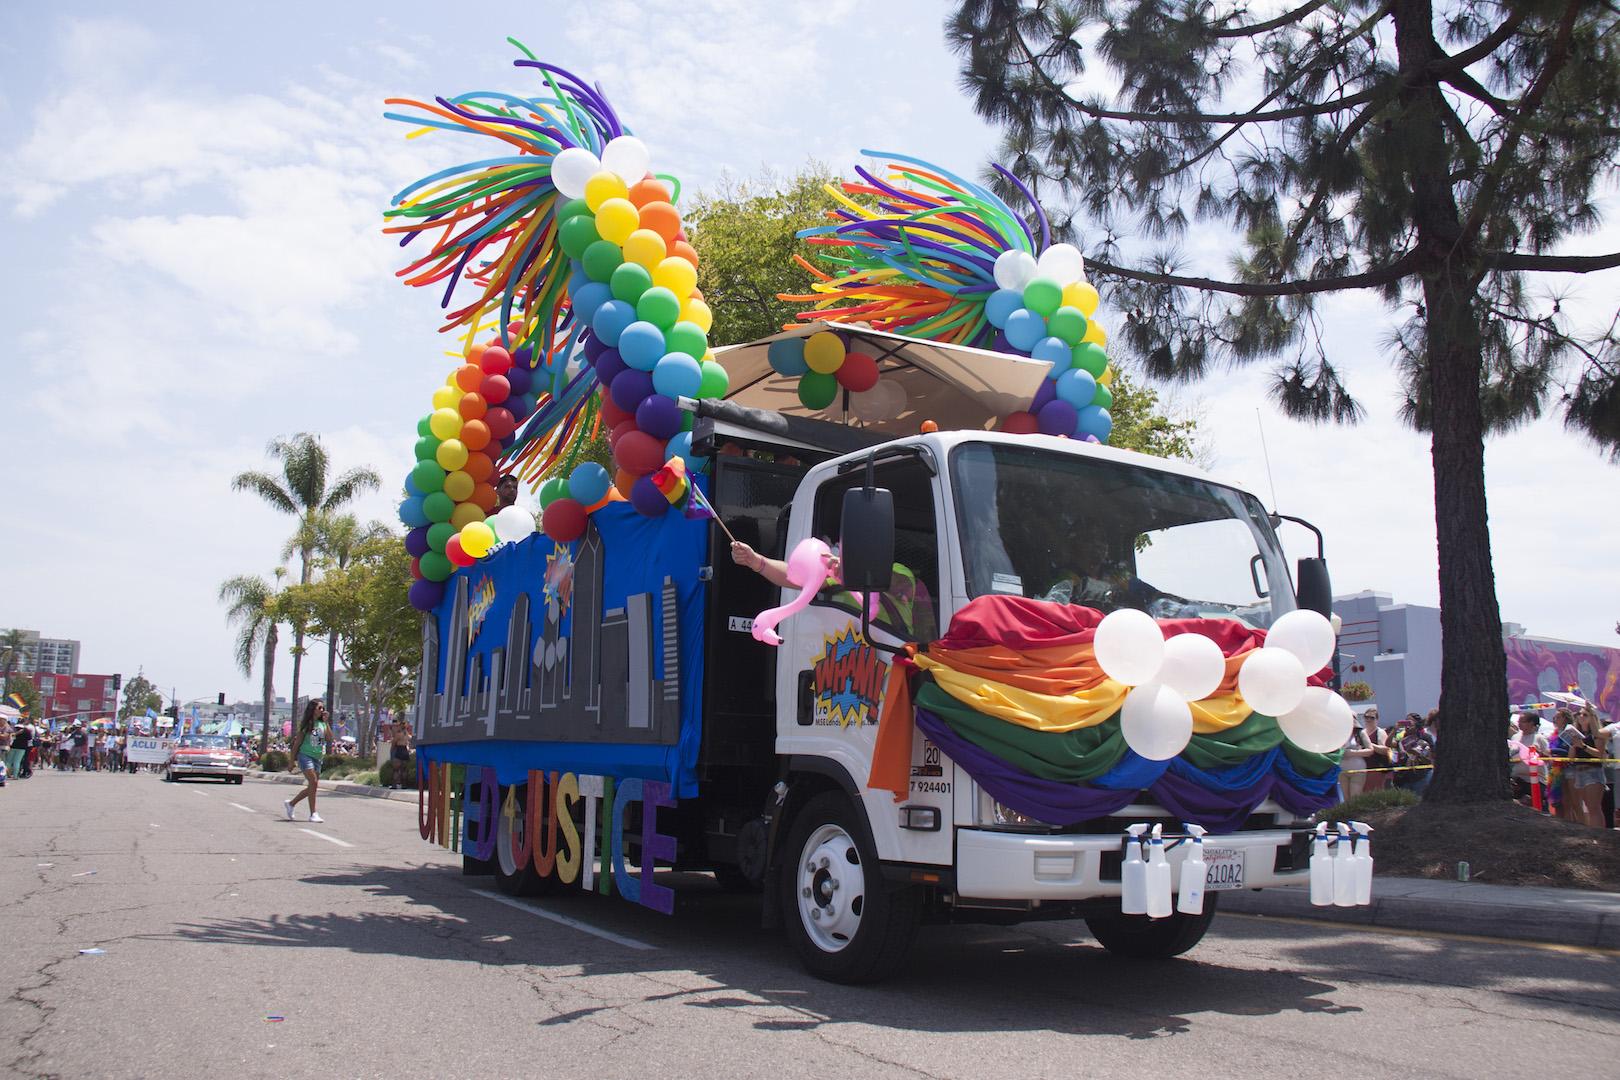 2017 S Best Pride Parade Floats San Diego Lgbt Pride